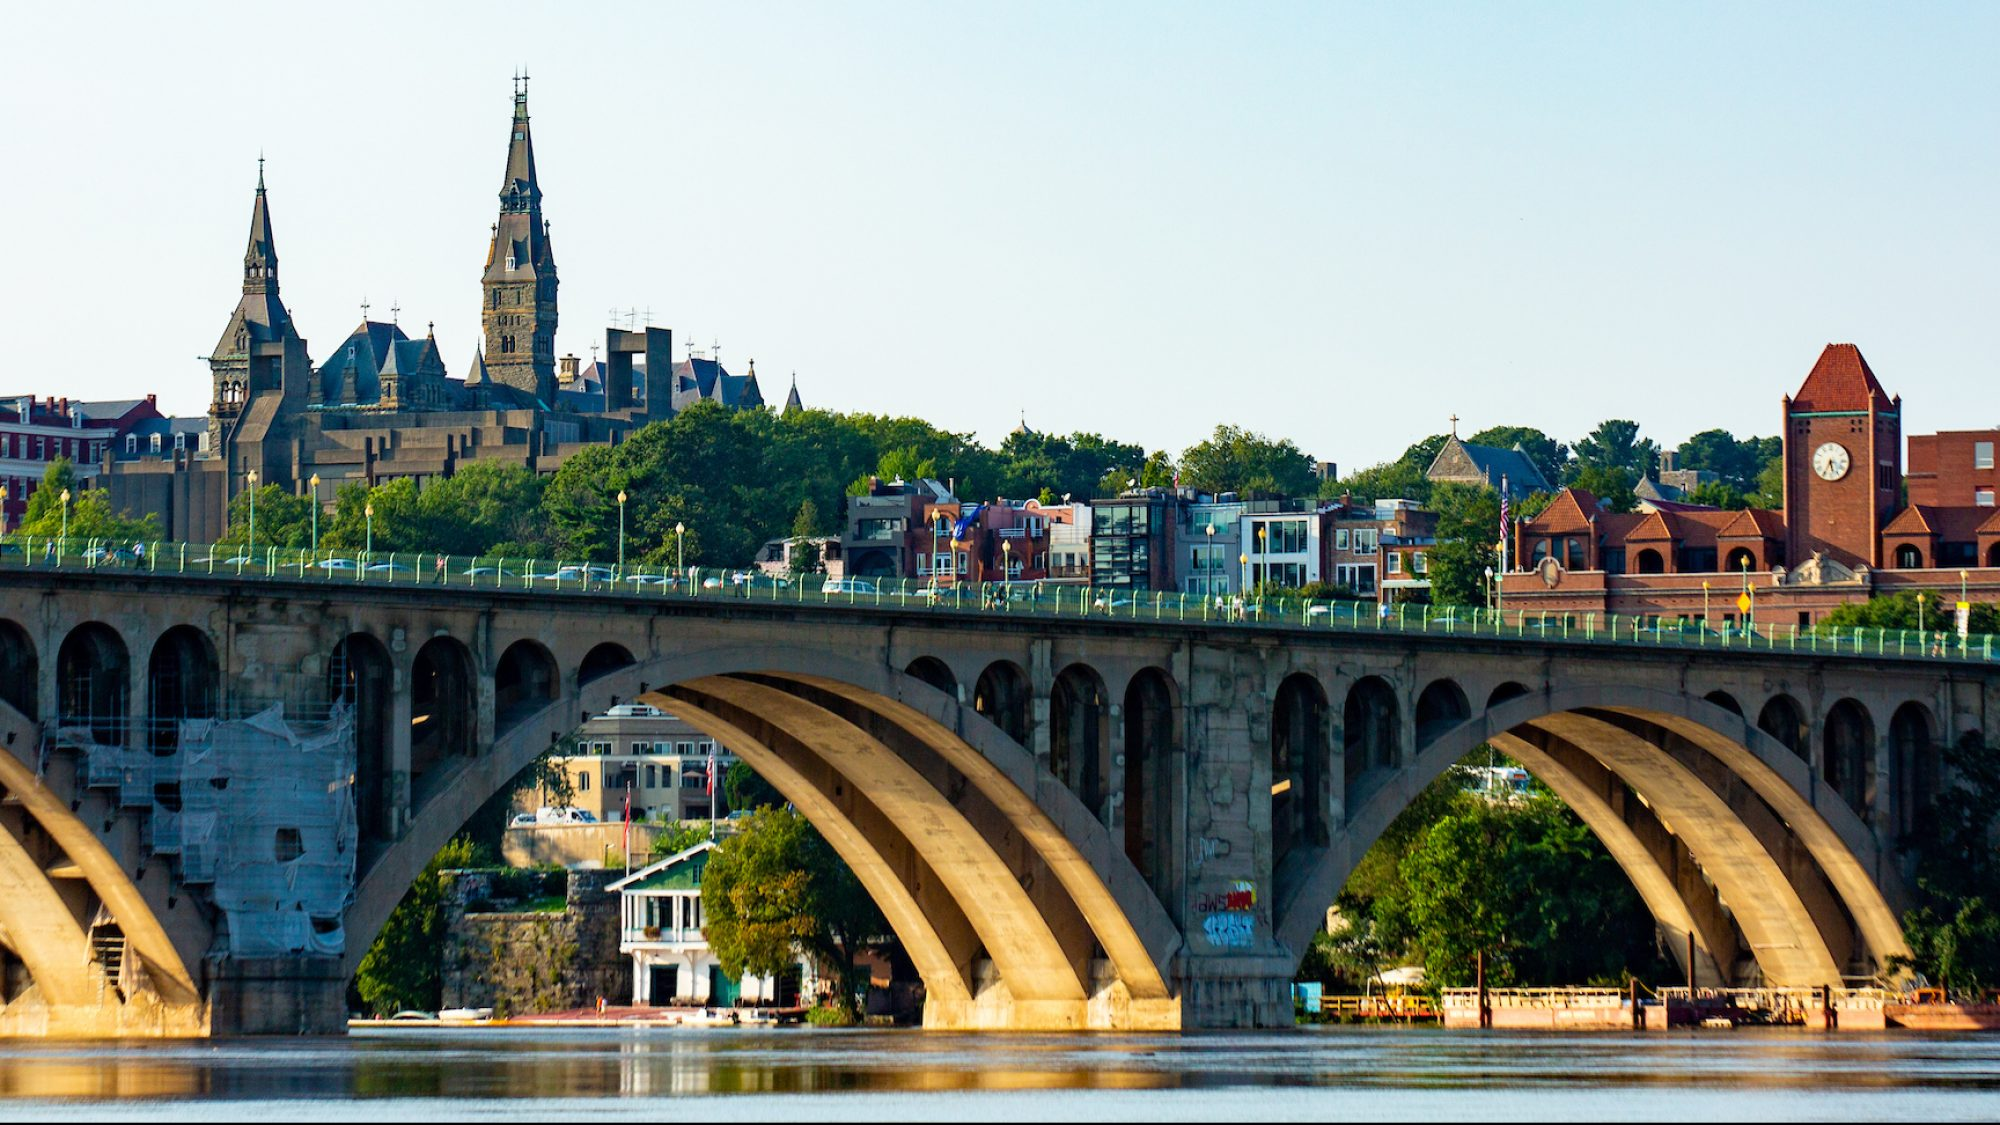 Healy Hall, Car Barn and Key Bridge from across the Potomac River